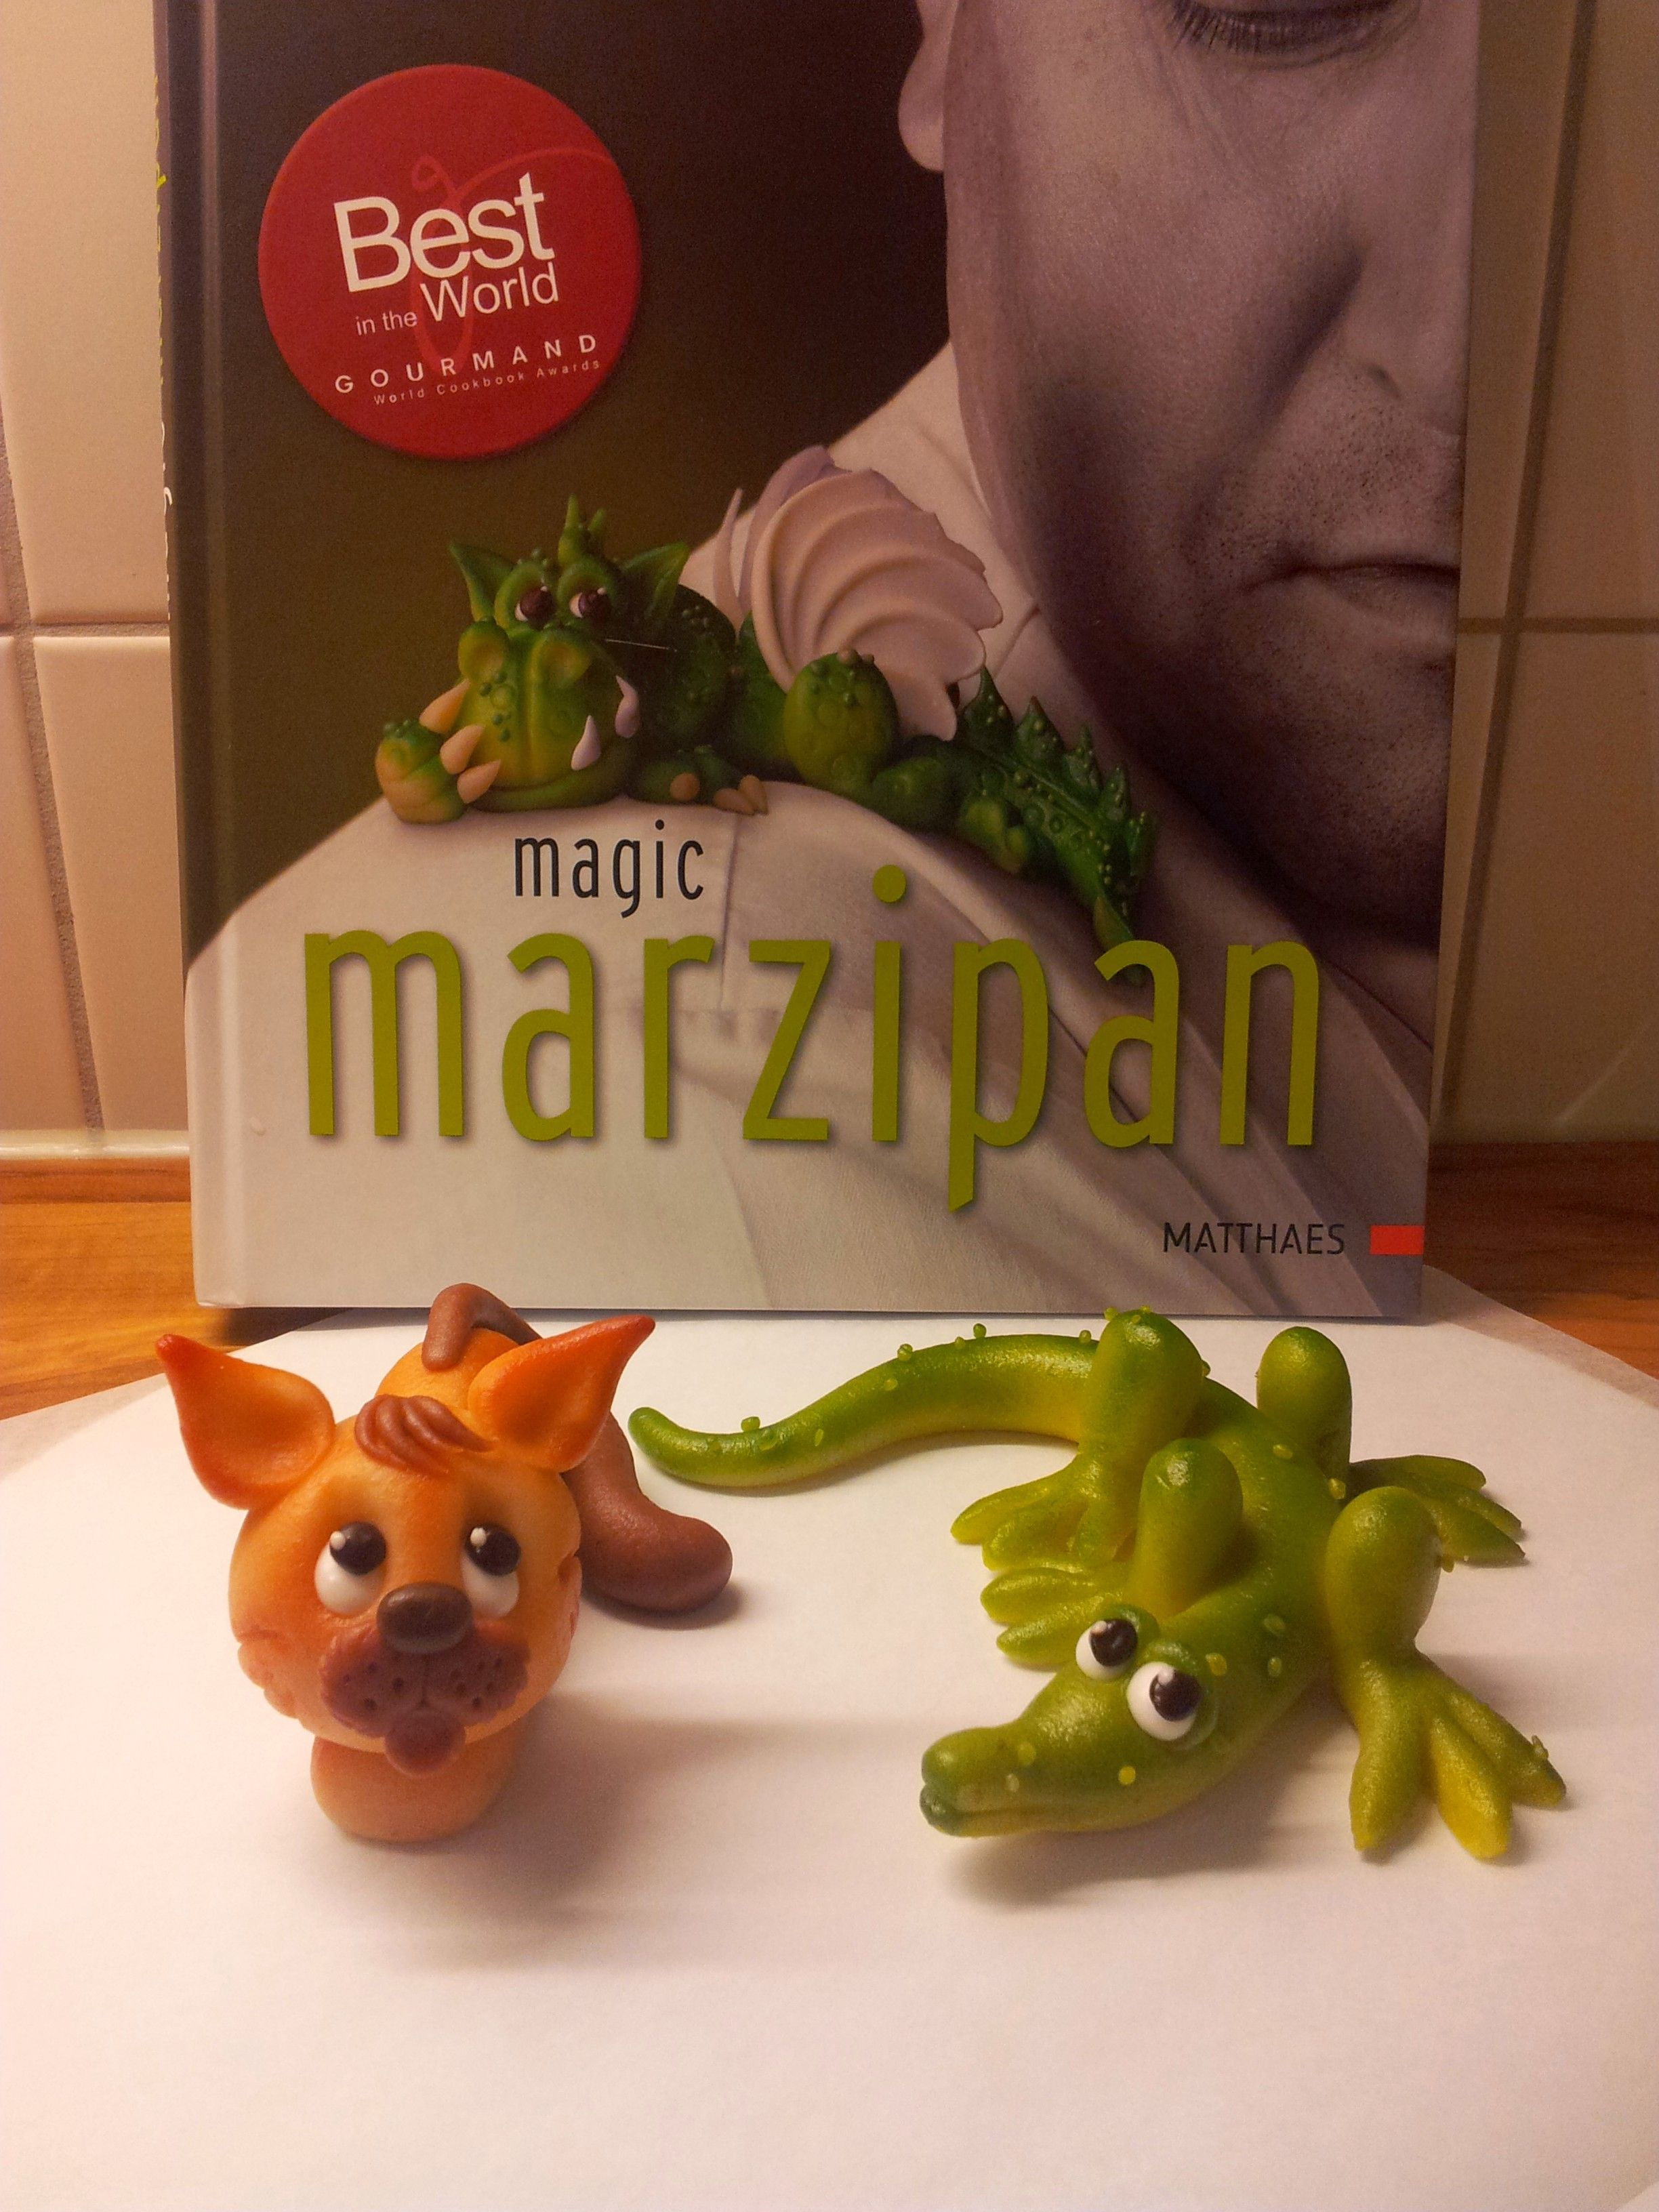 Marzipanfiguren   Marzipanfiguren, Marzipan, Figur